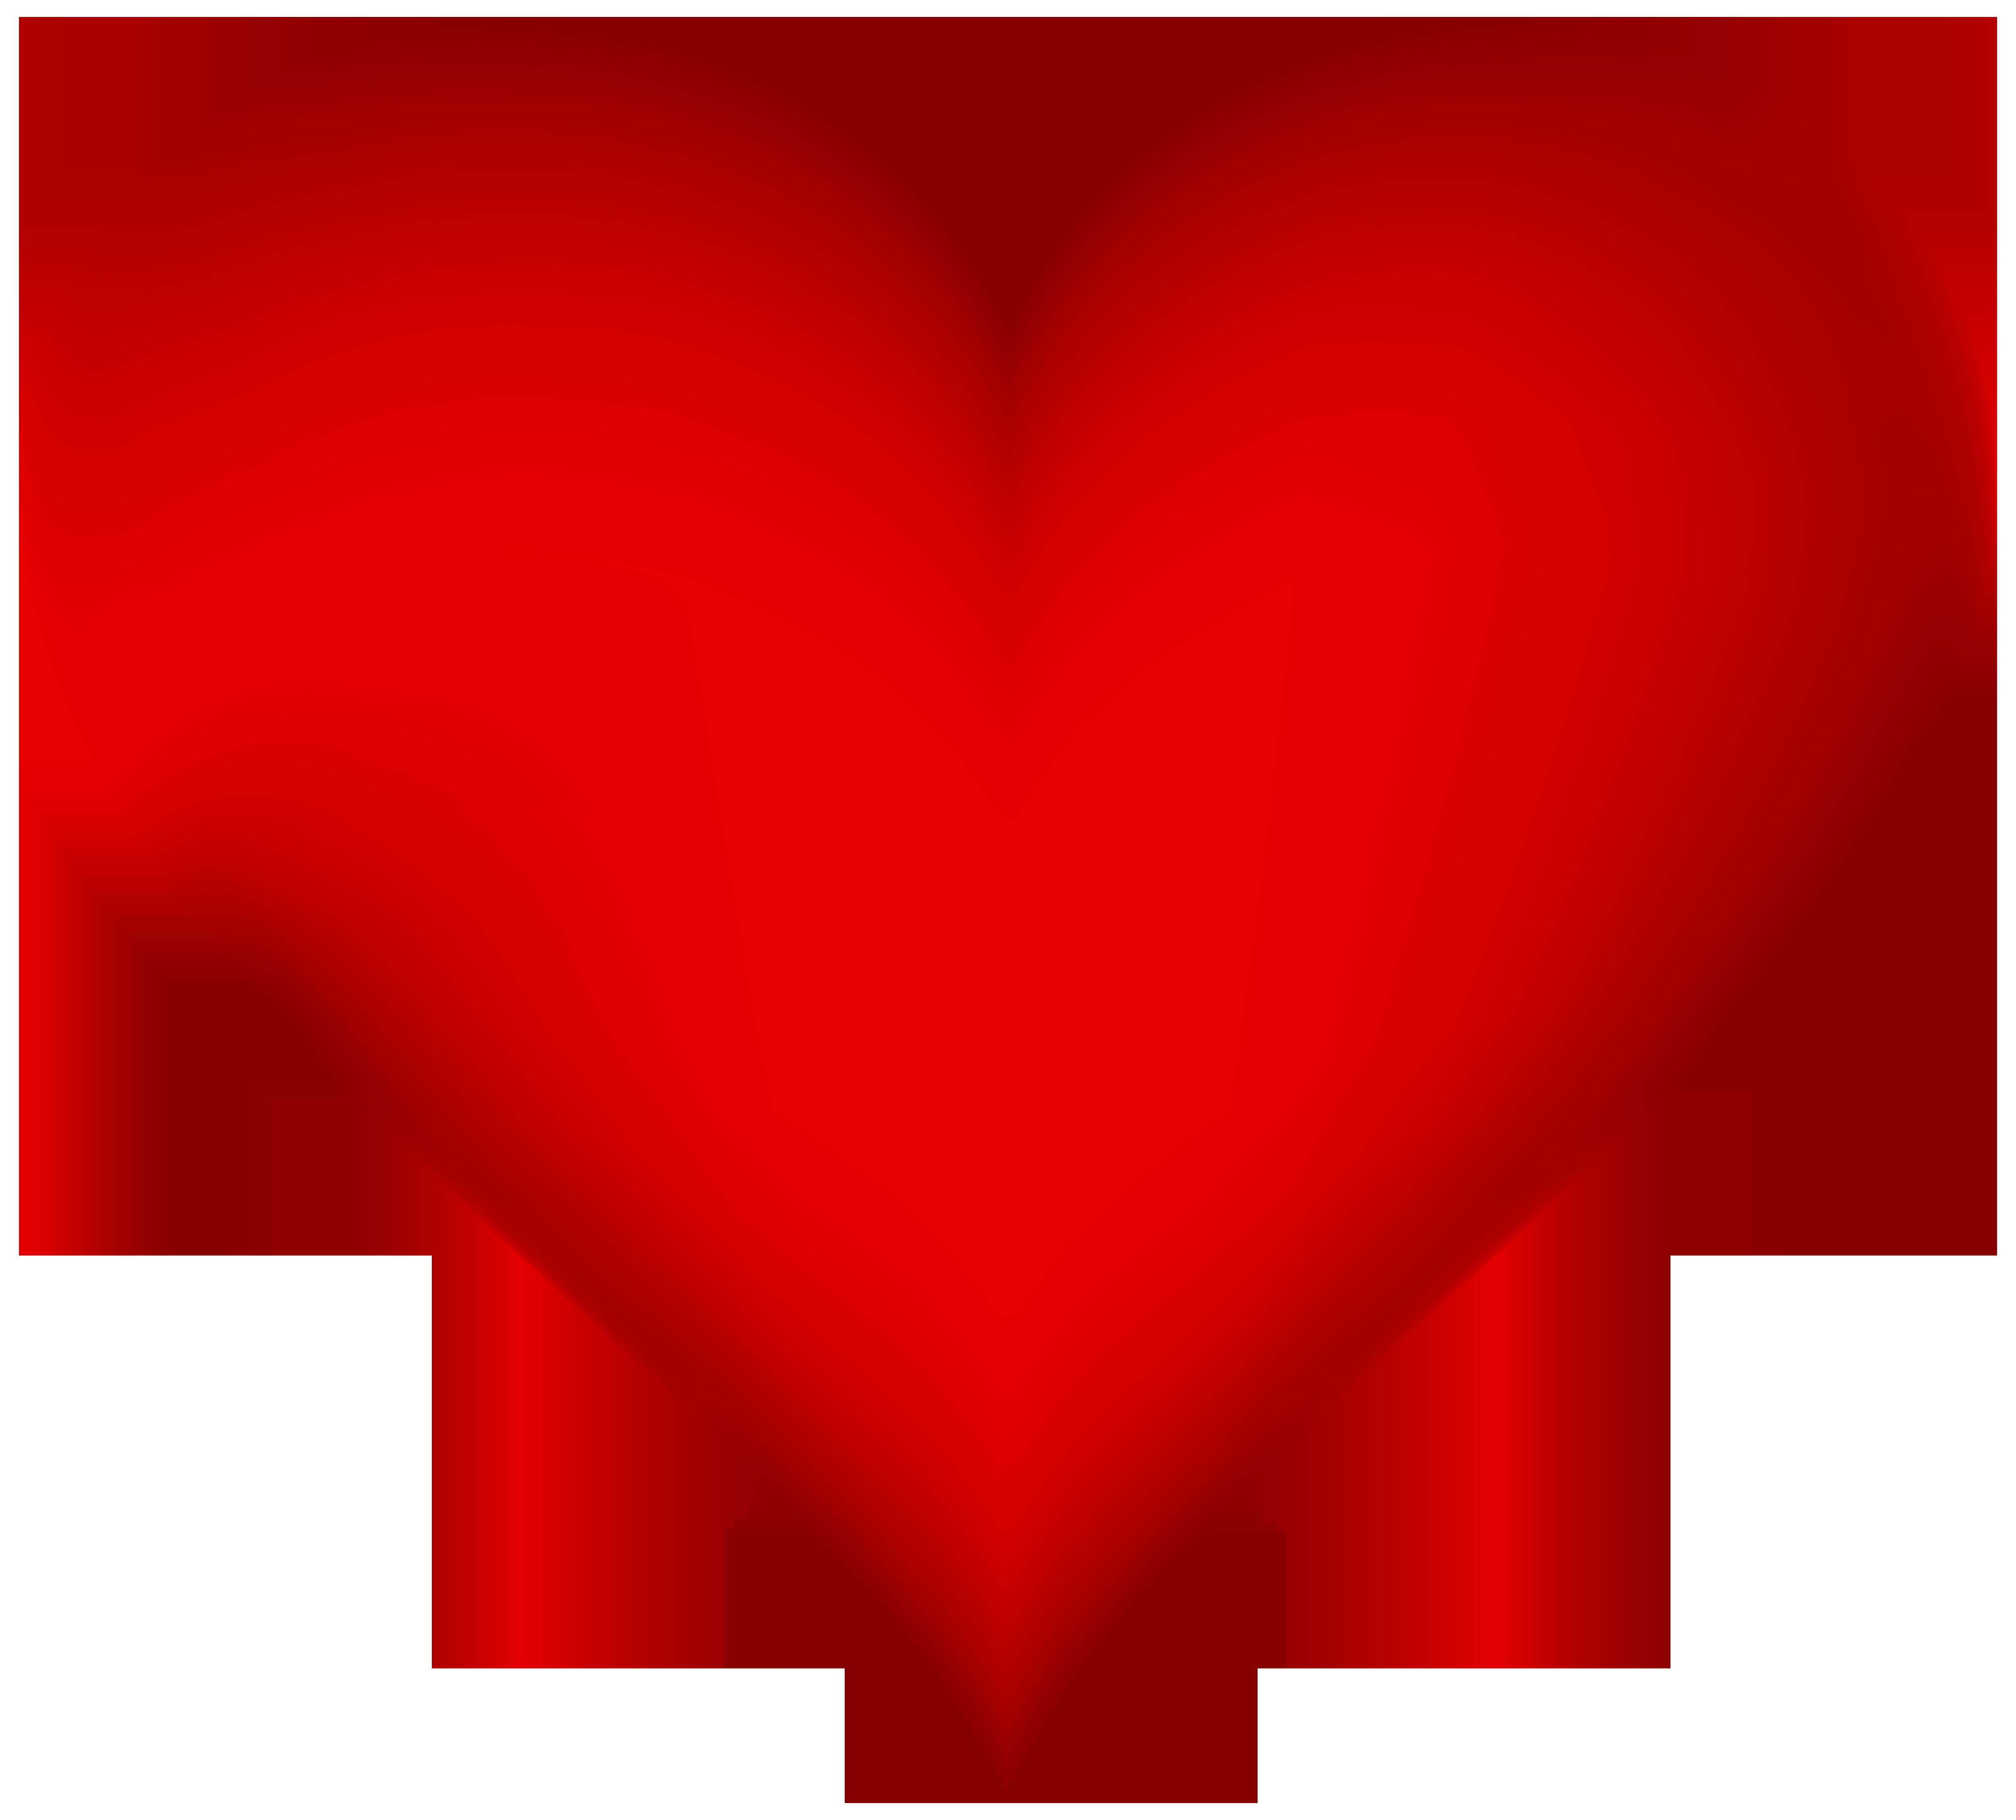 Png best web. Clipart heart